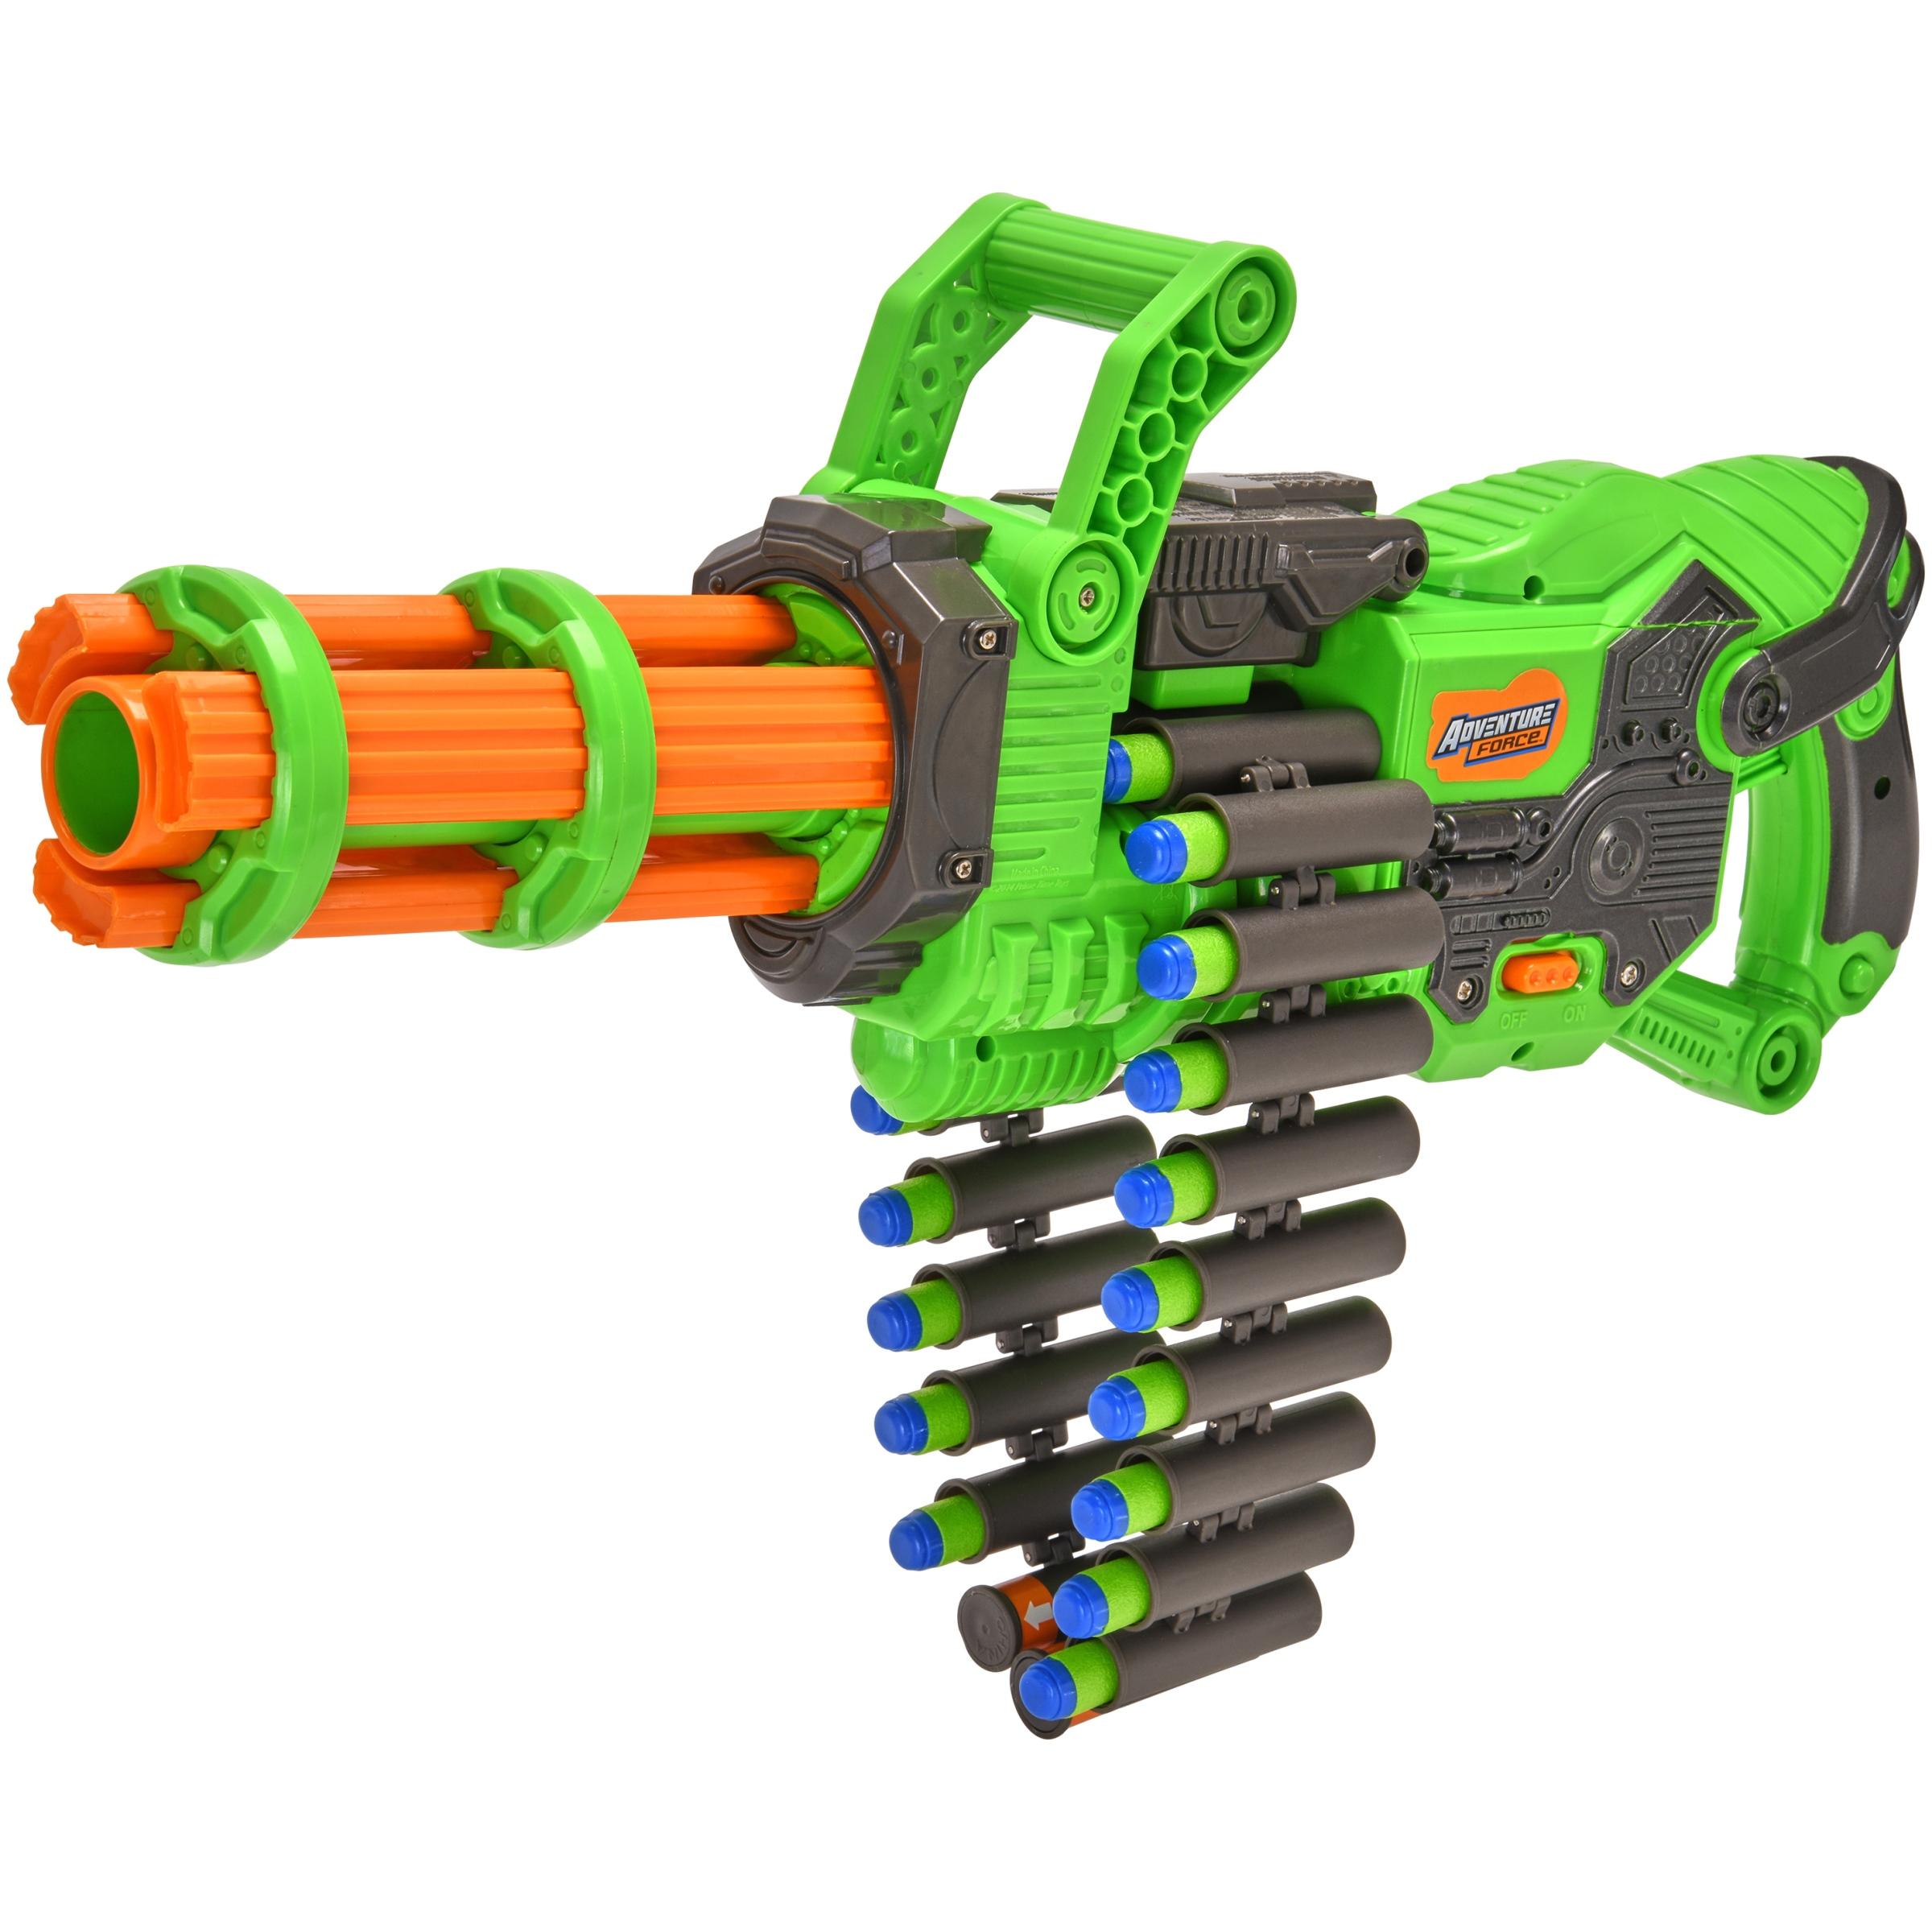 Adventure Force Scorpion Rotating Barrel Auto Gatling Blaster, Green